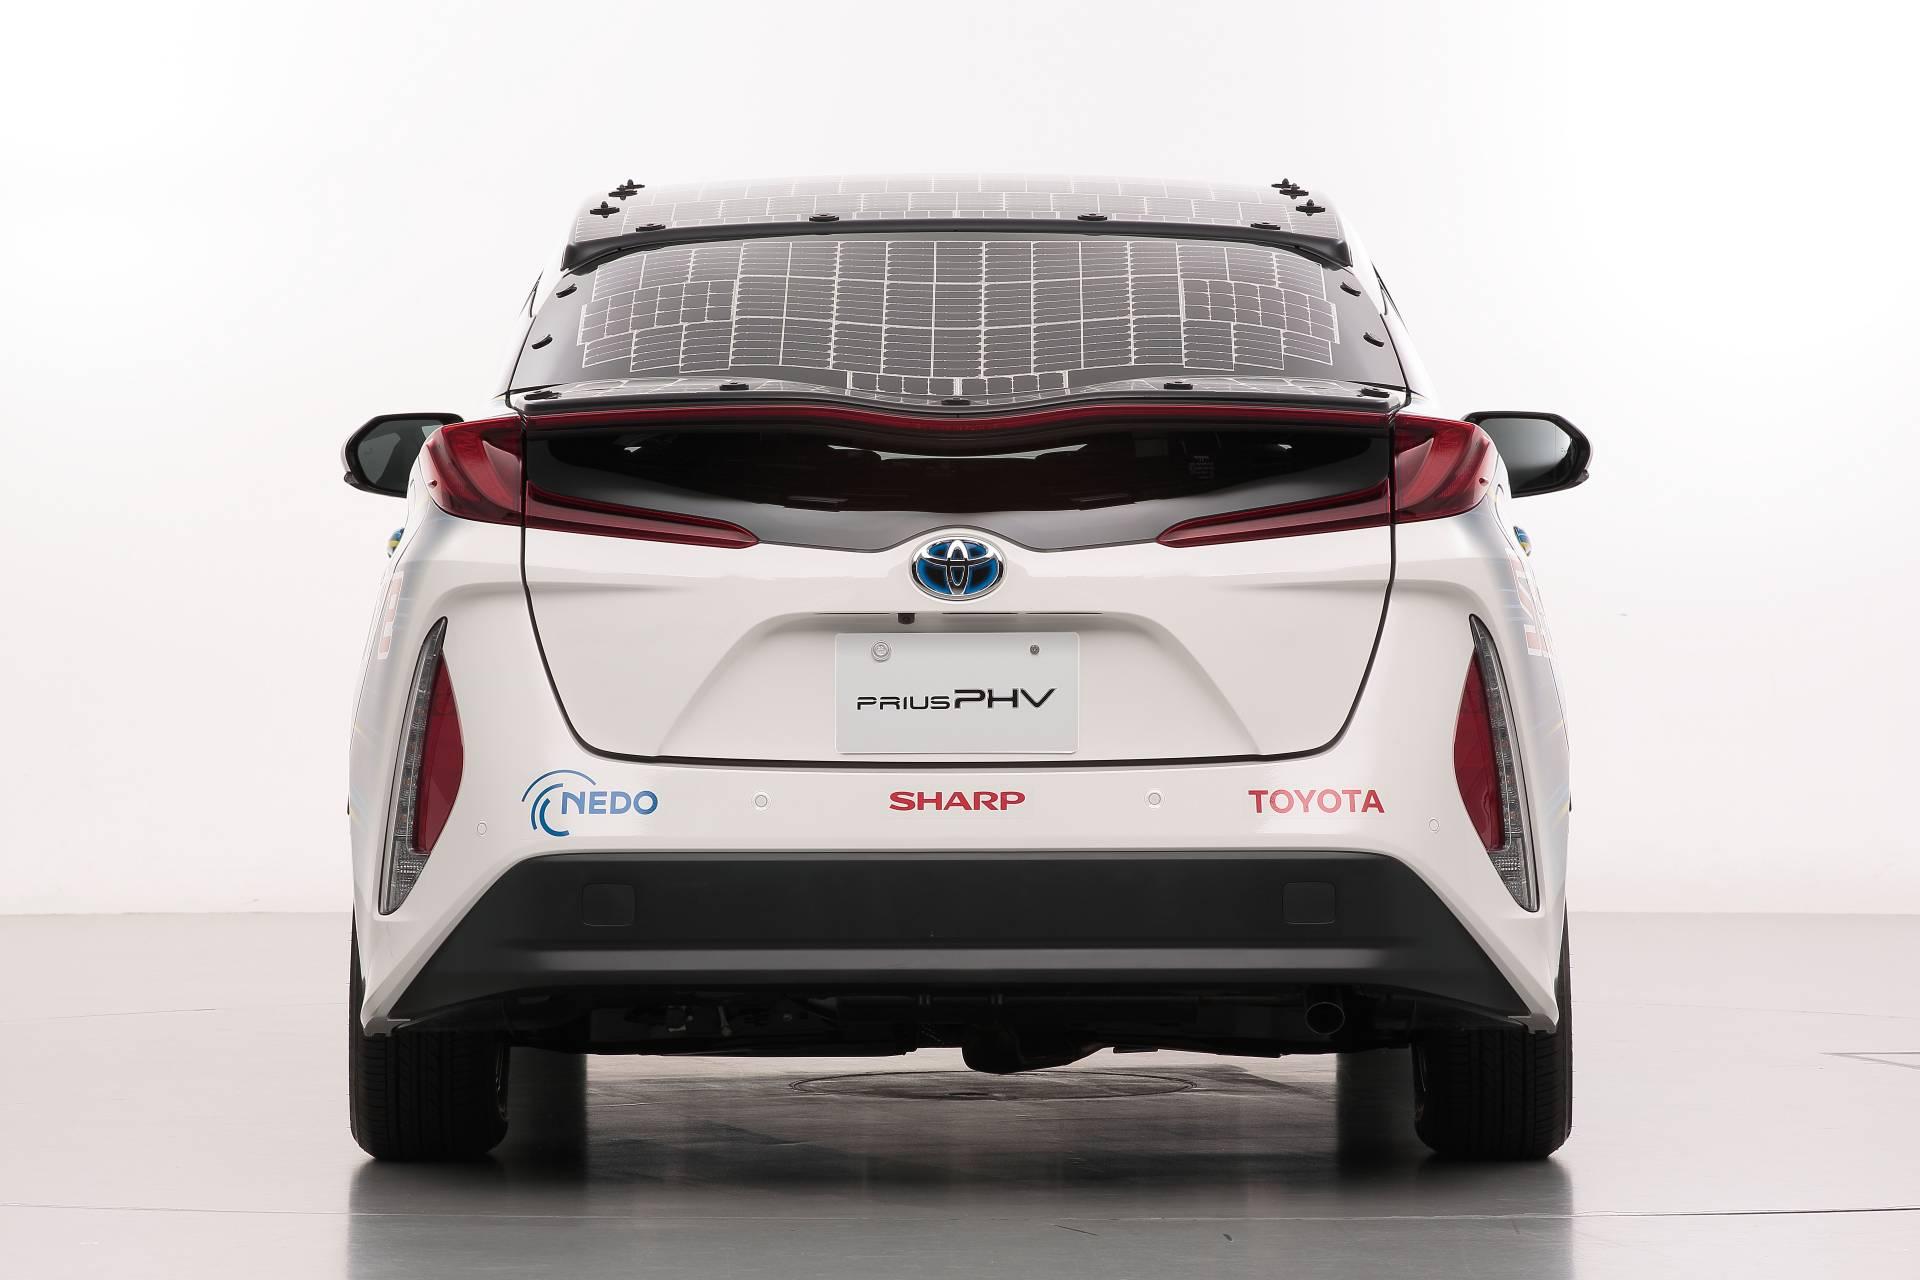 Toyota-Prius-Prime-With-Solar-Panels-2